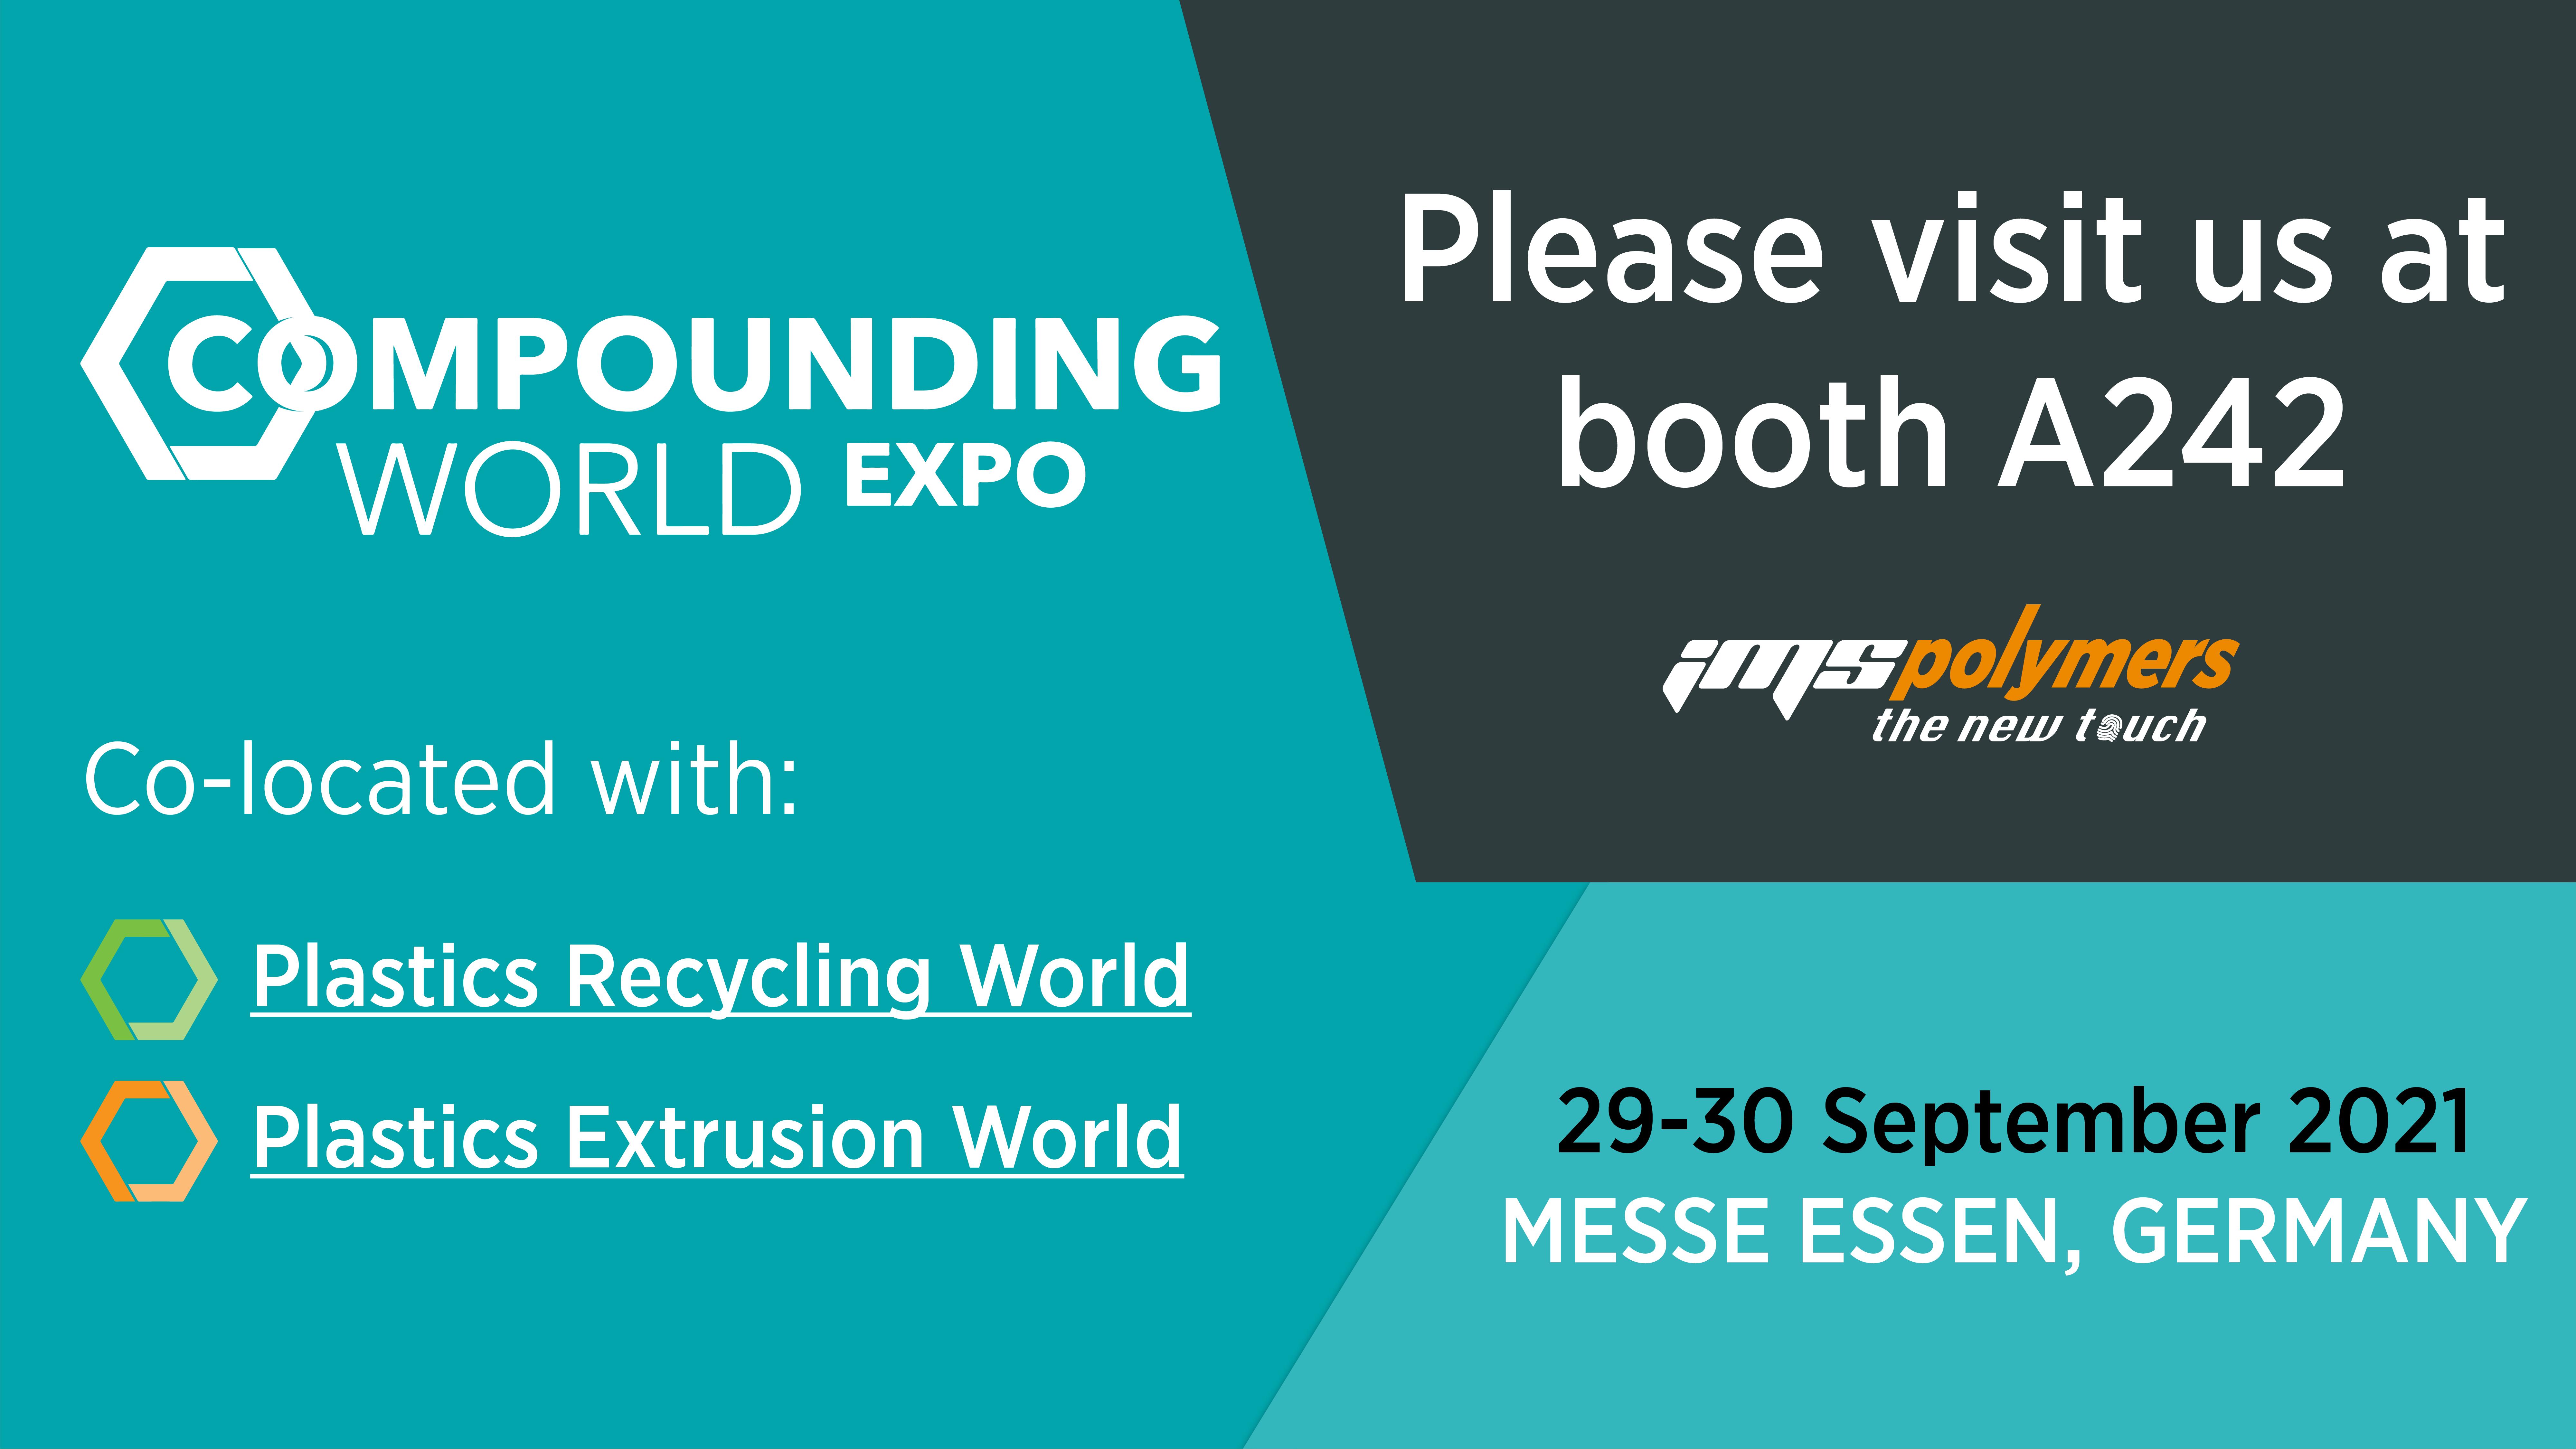 Compounding World Expo 2021